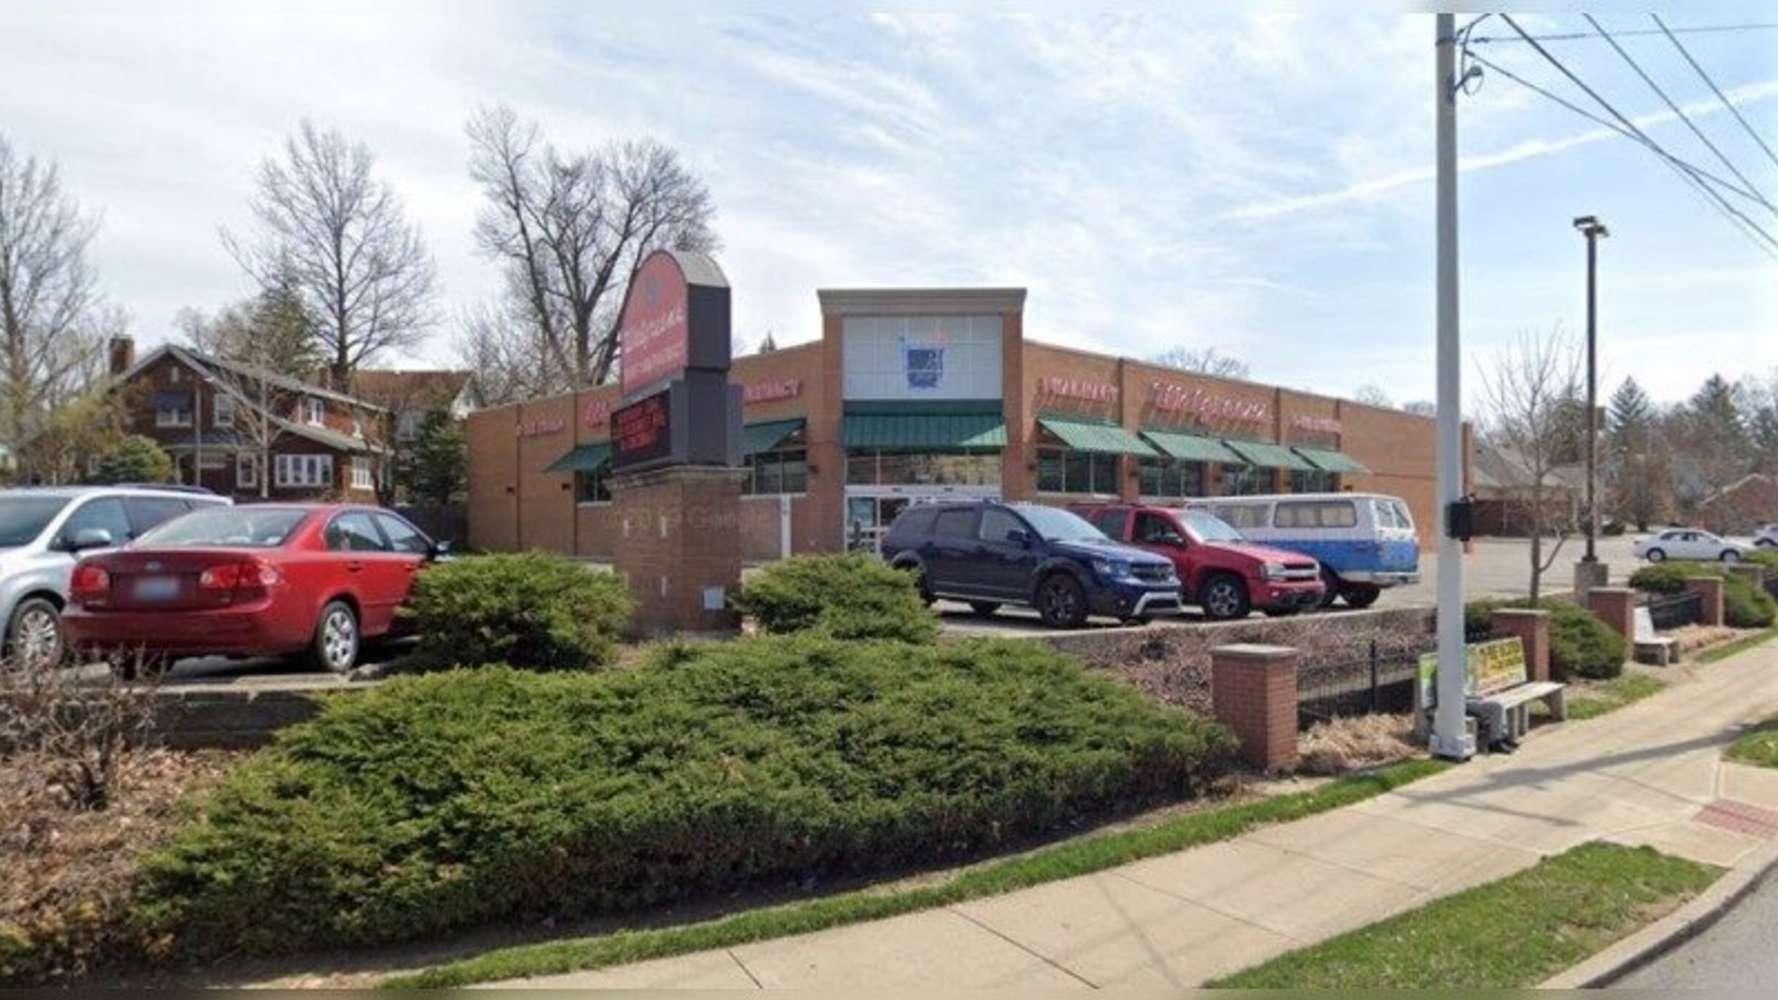 Retail Cincinnati, 45211 - Walgreens 7182 - HARRISON AVENUE - Cincinnati, OH